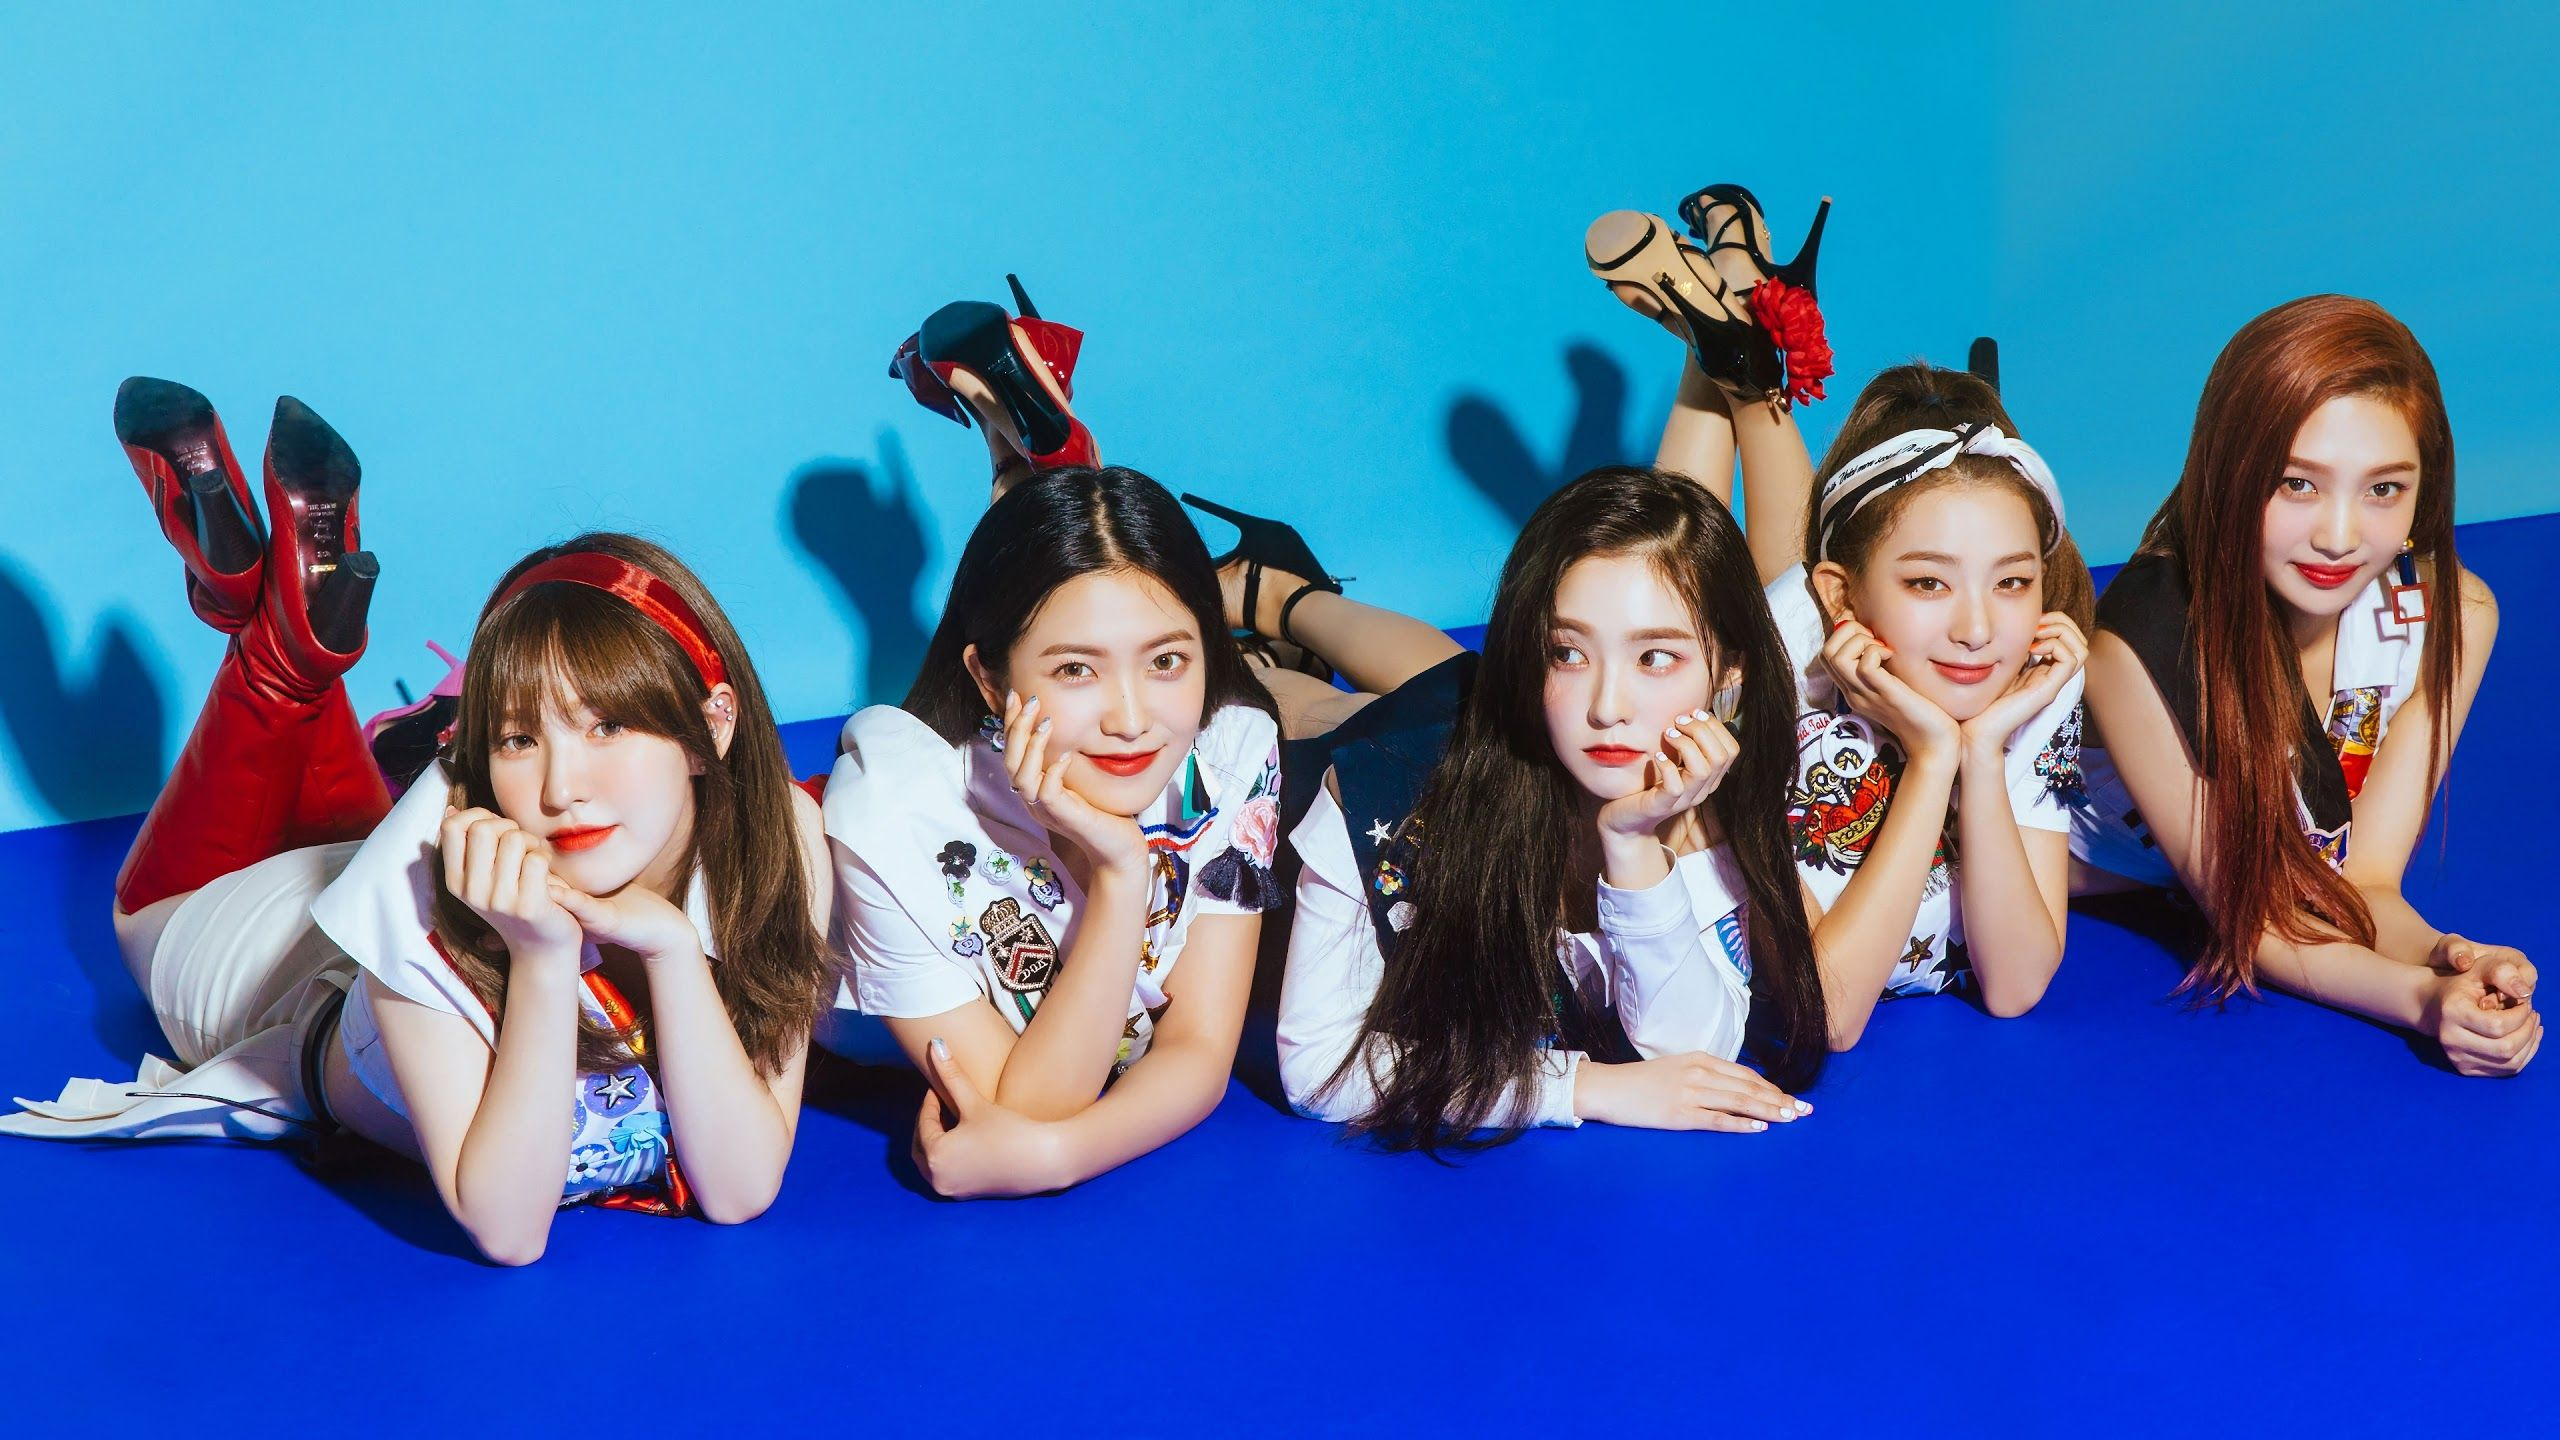 Red Velvet Pc Wallpapers Top Free Red Velvet Pc Backgrounds Wallpaperaccess